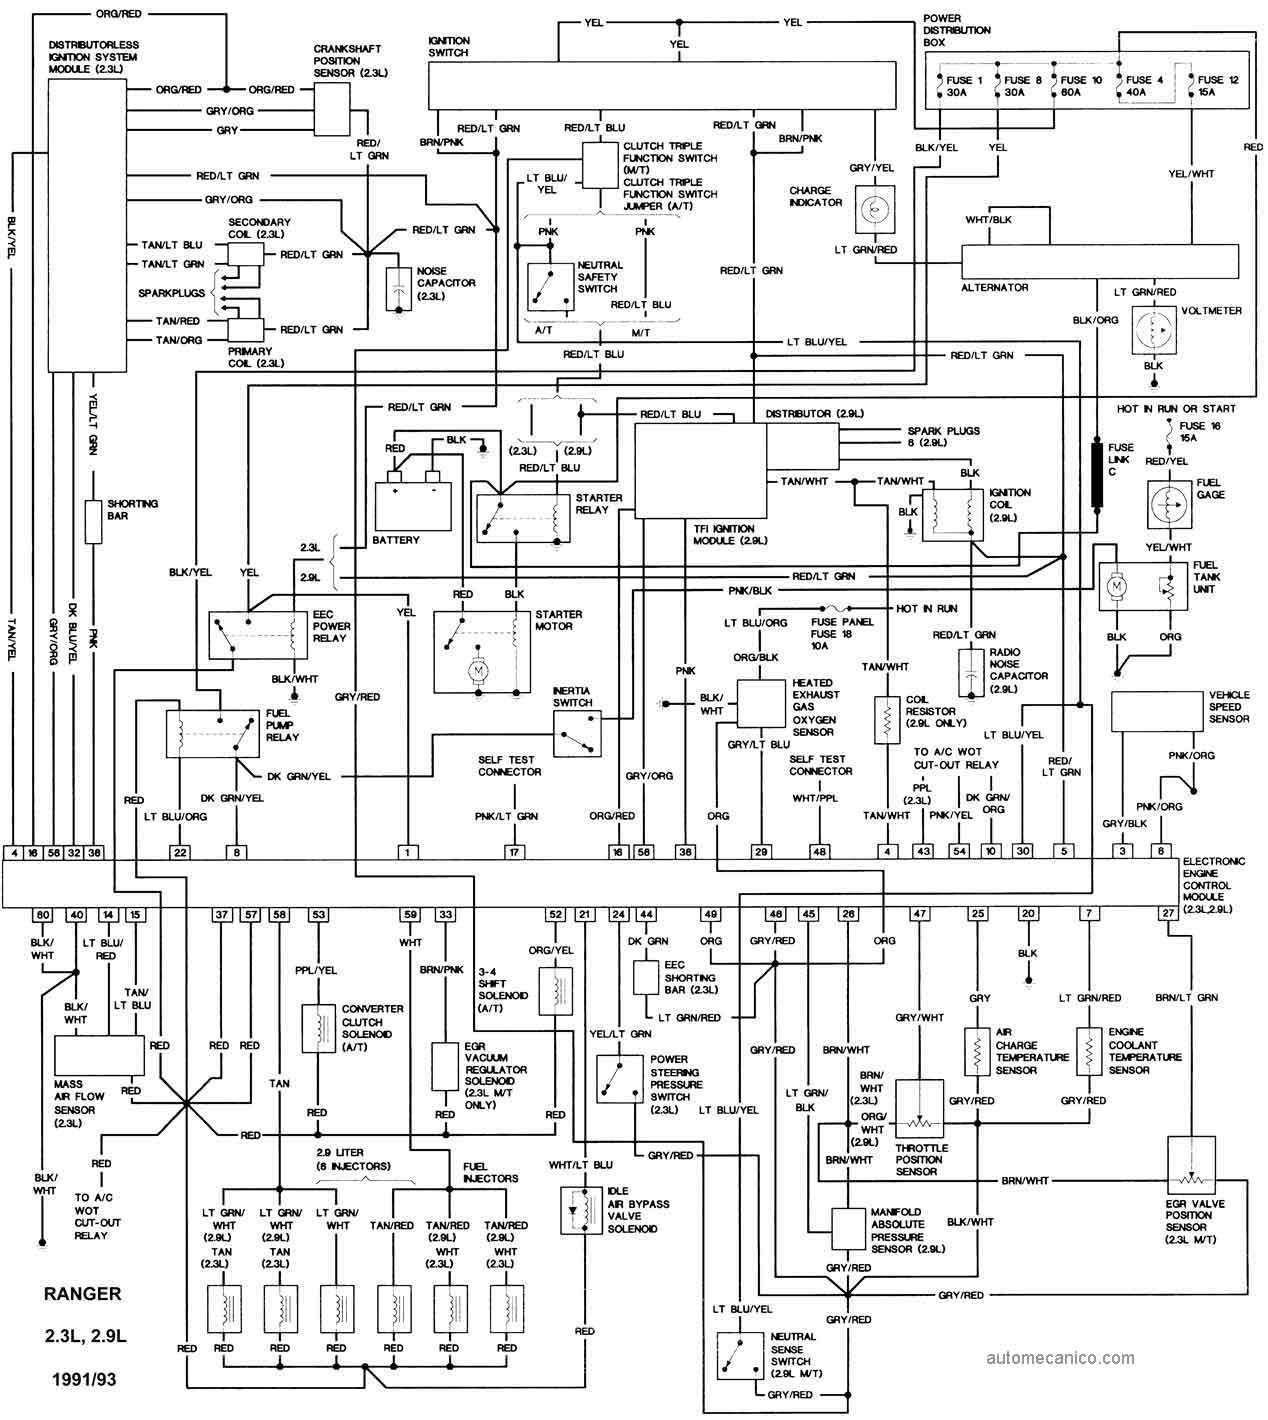 99 ford ranger xlt radio wiring diagram car horn relay esquemas diagramas graphics